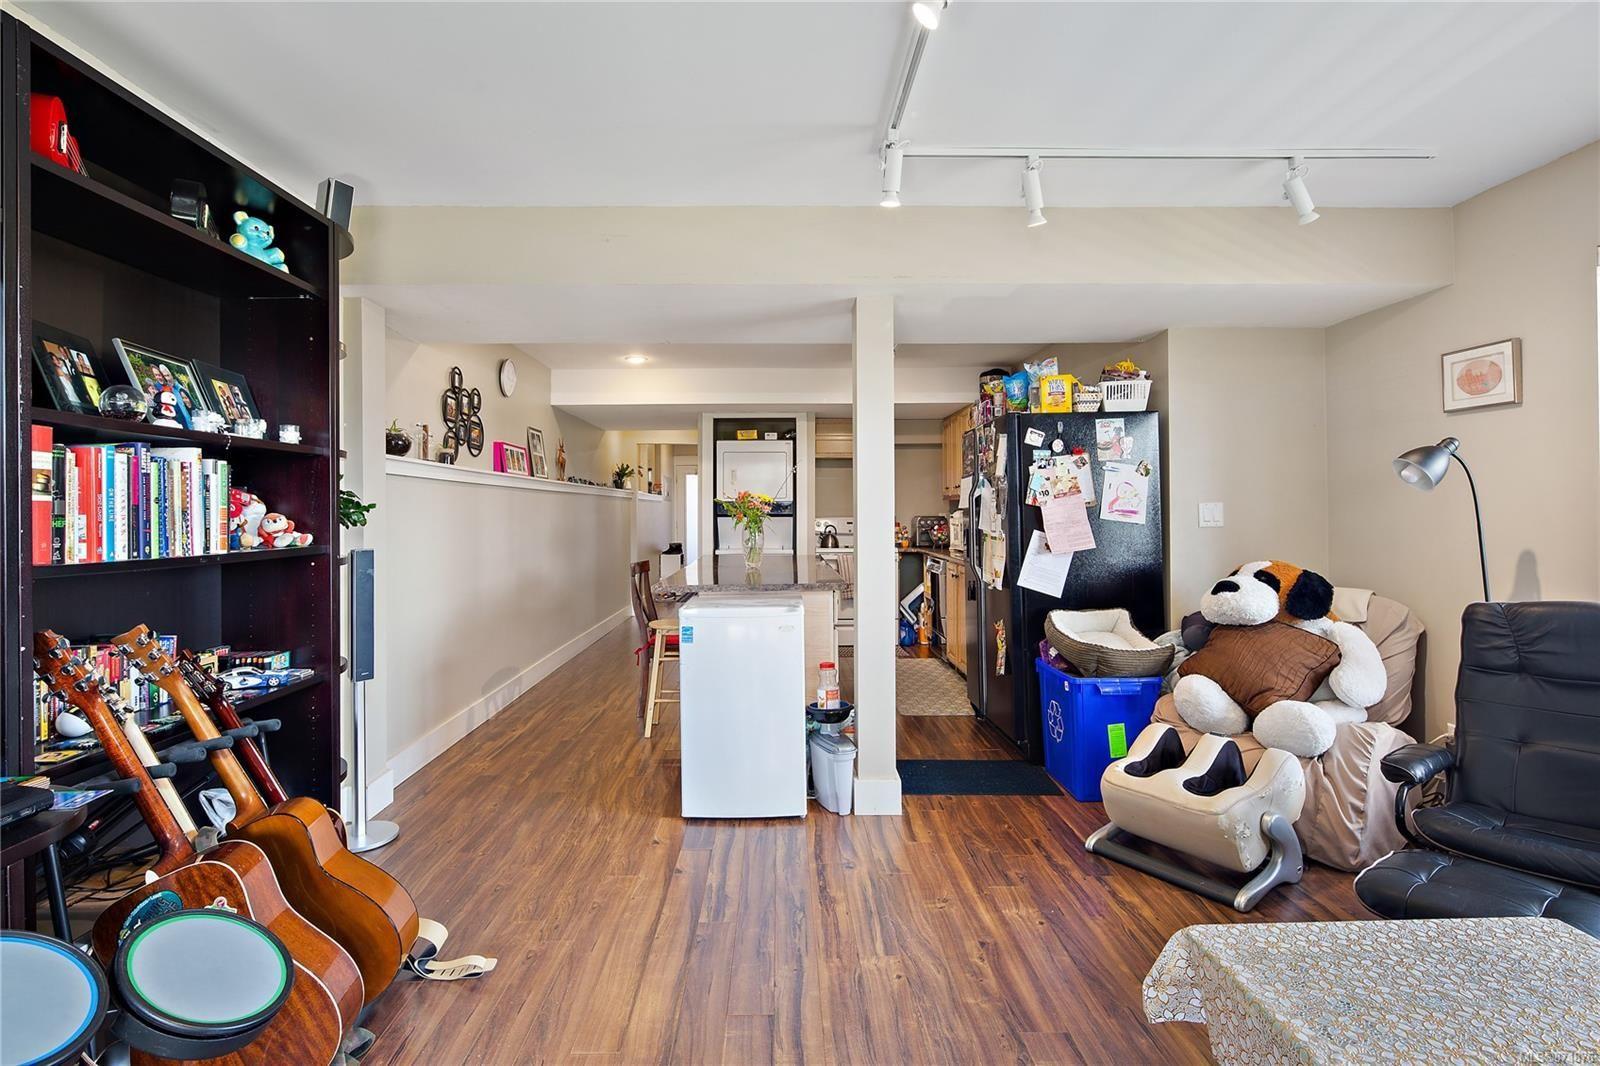 Photo 36: Photos: 4420 Wilkinson Rd in : SW Royal Oak House for sale (Saanich West)  : MLS®# 871876